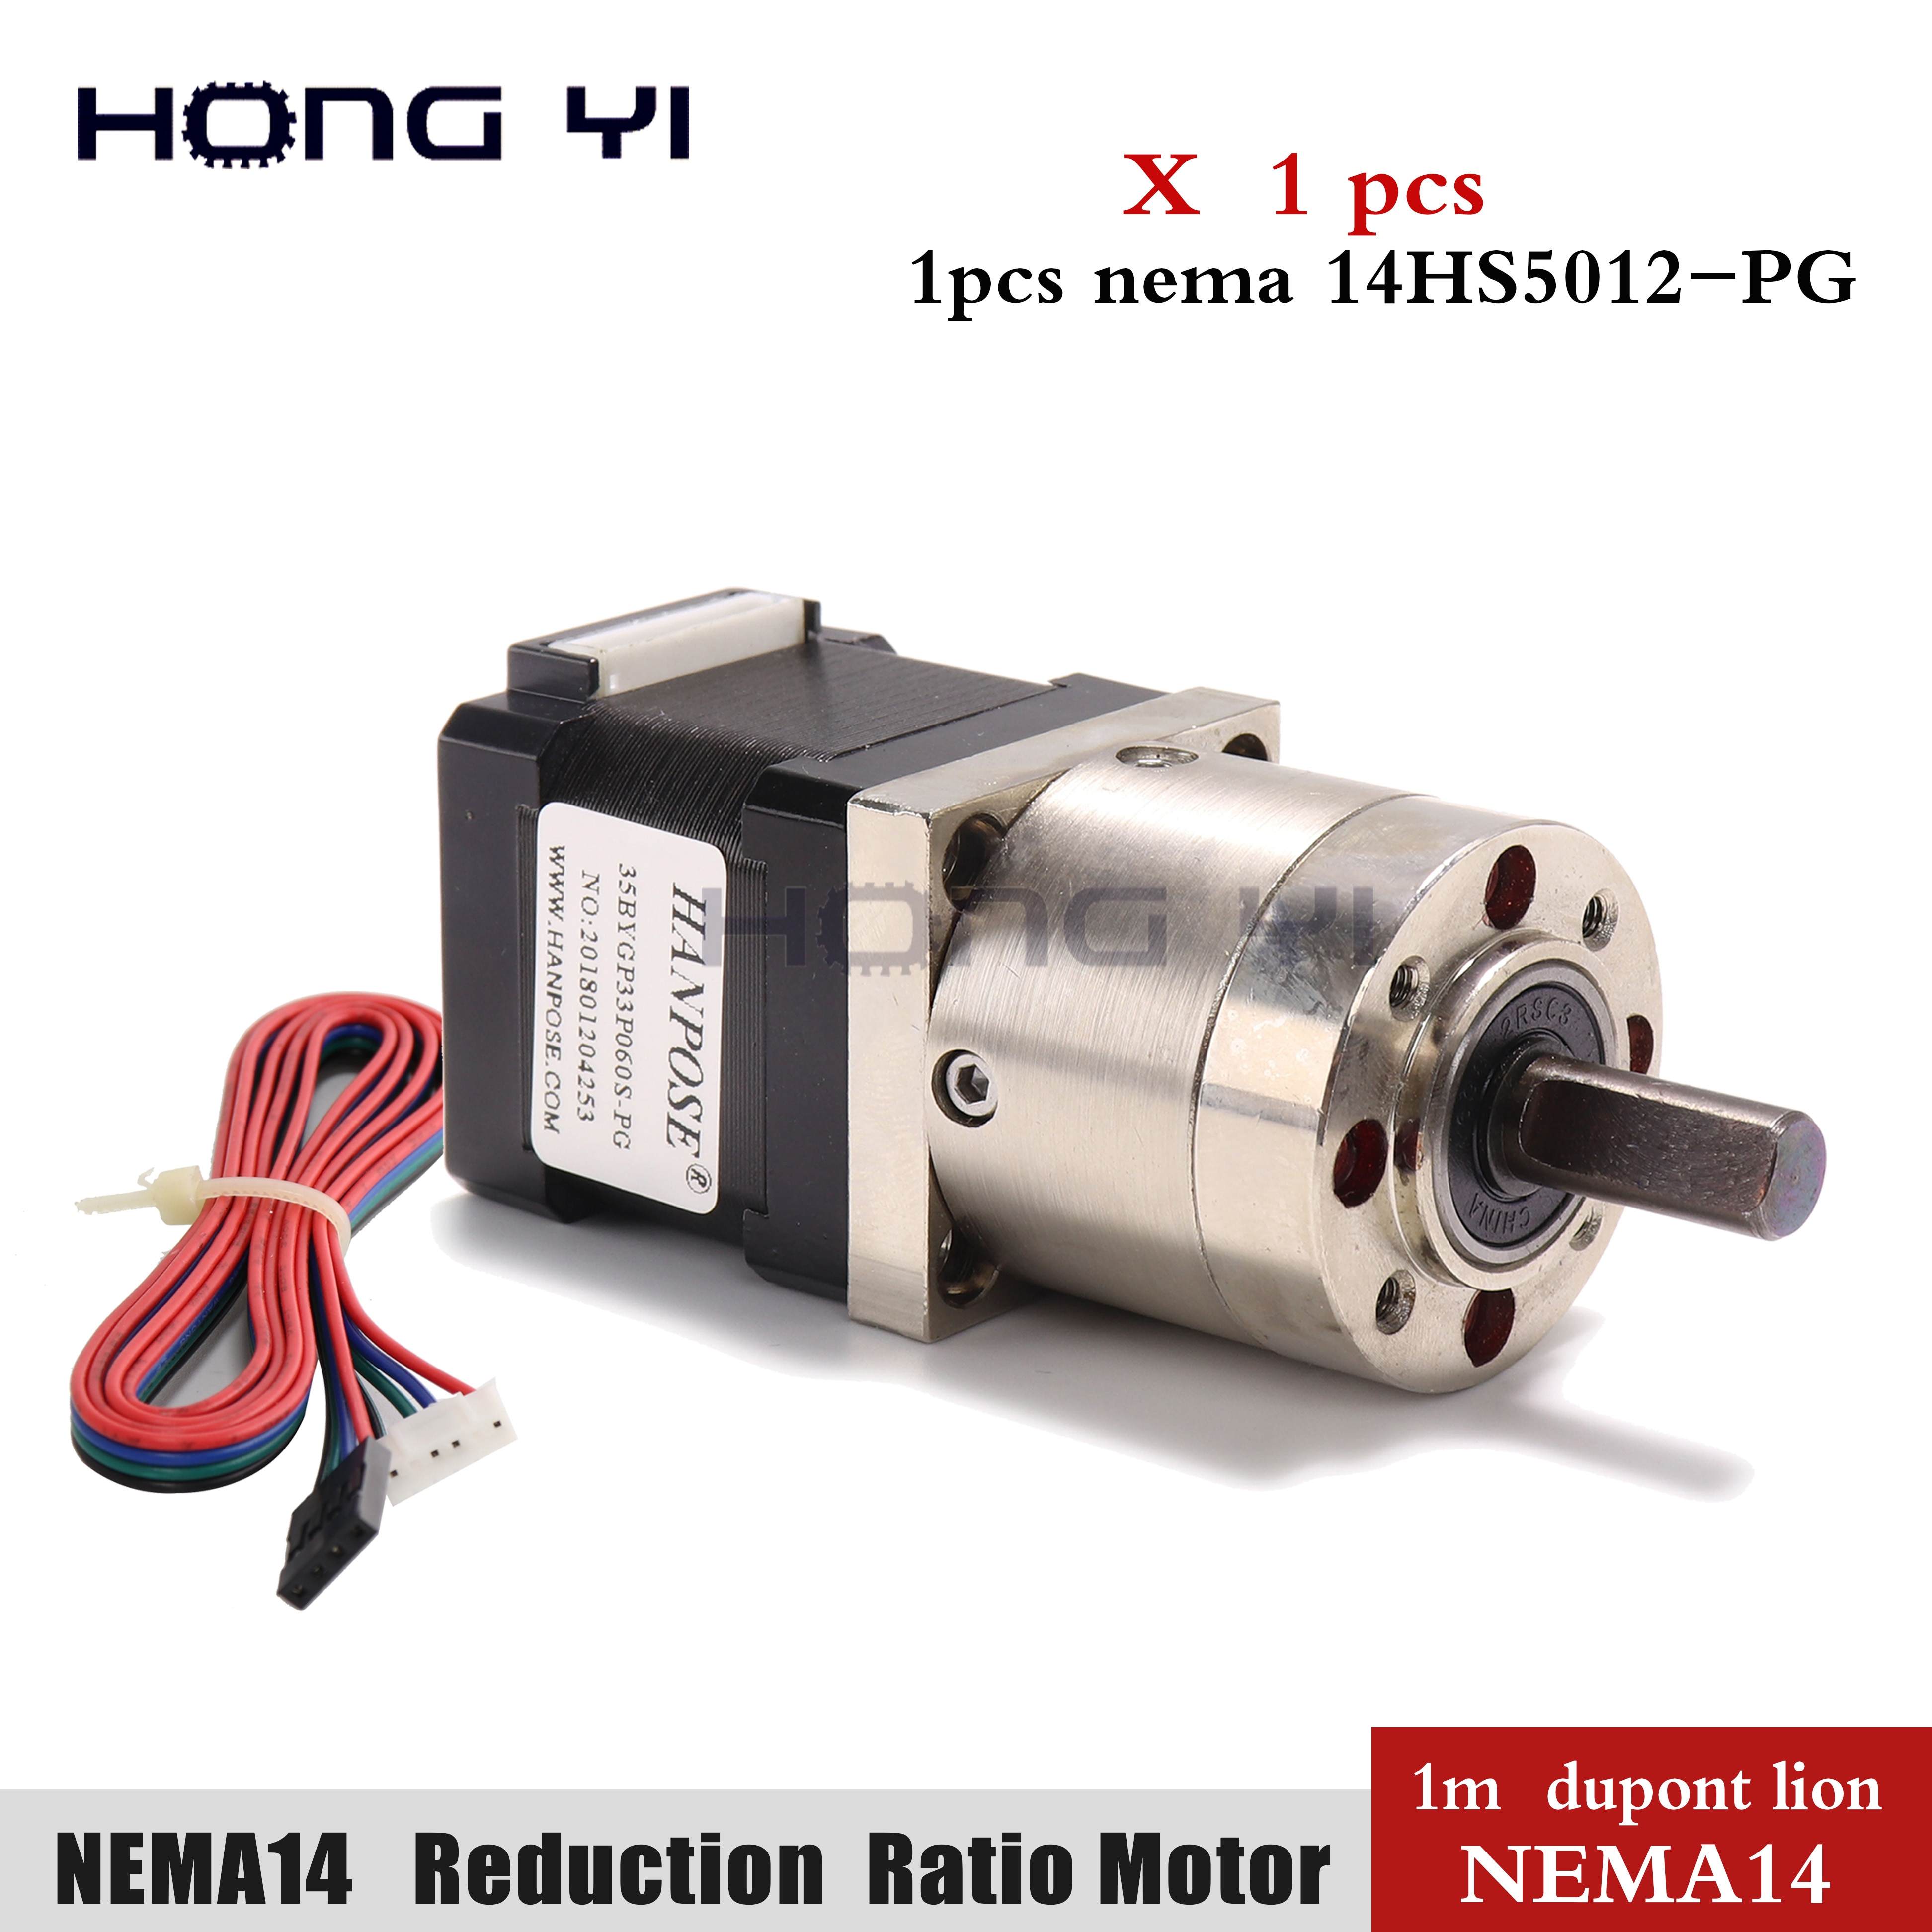 14HS5012 -PG Nema14 محرك متدرج 4-lead Nema14 موتور الطارد والعتاد نسبة محرك متدرج 5.18:1 علبة التروس الكوكبية